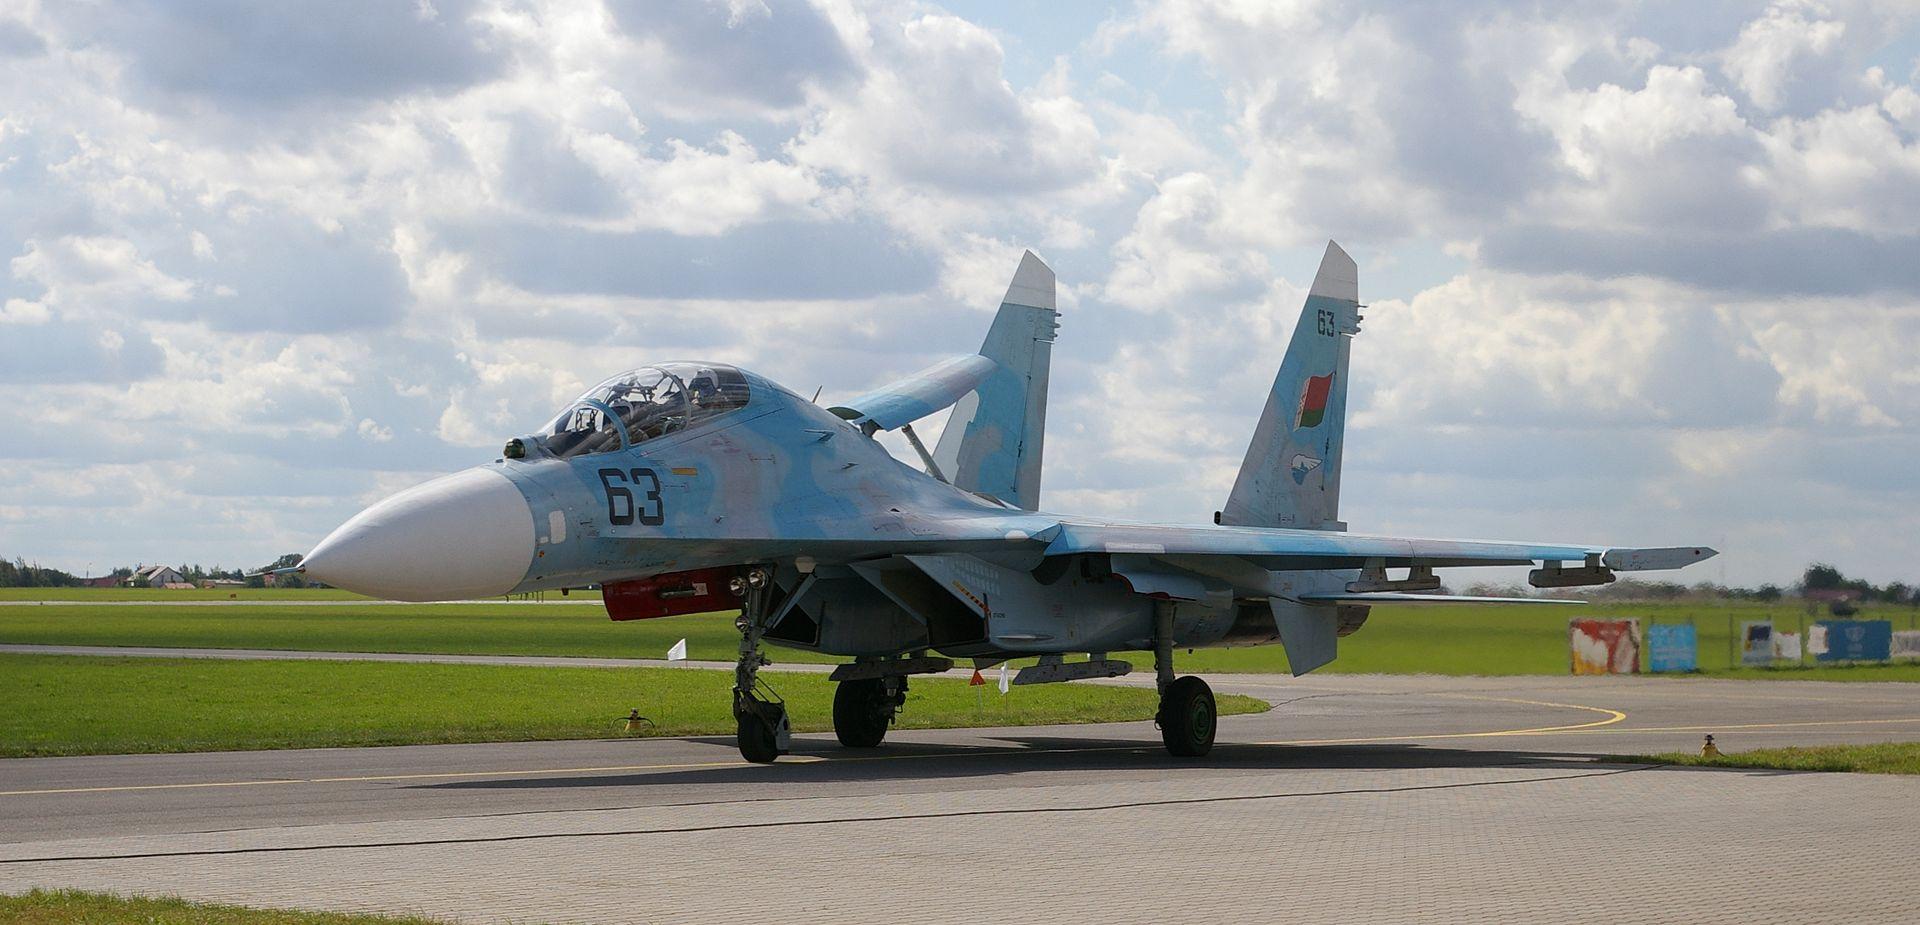 Su 27 (航空機)の画像 p1_32